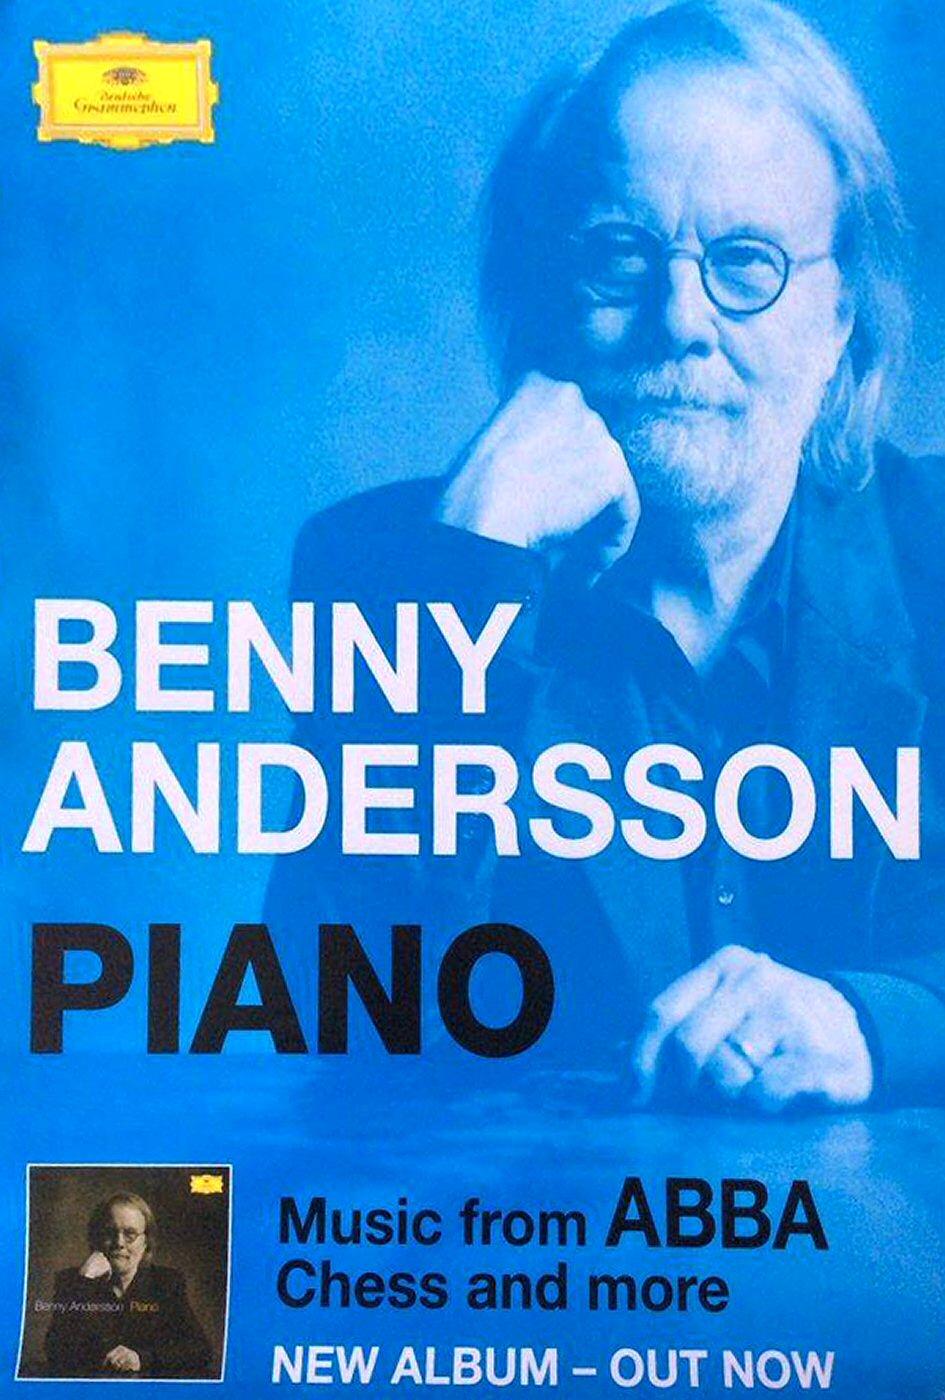 benny anderssons orkester kärlekens tid text